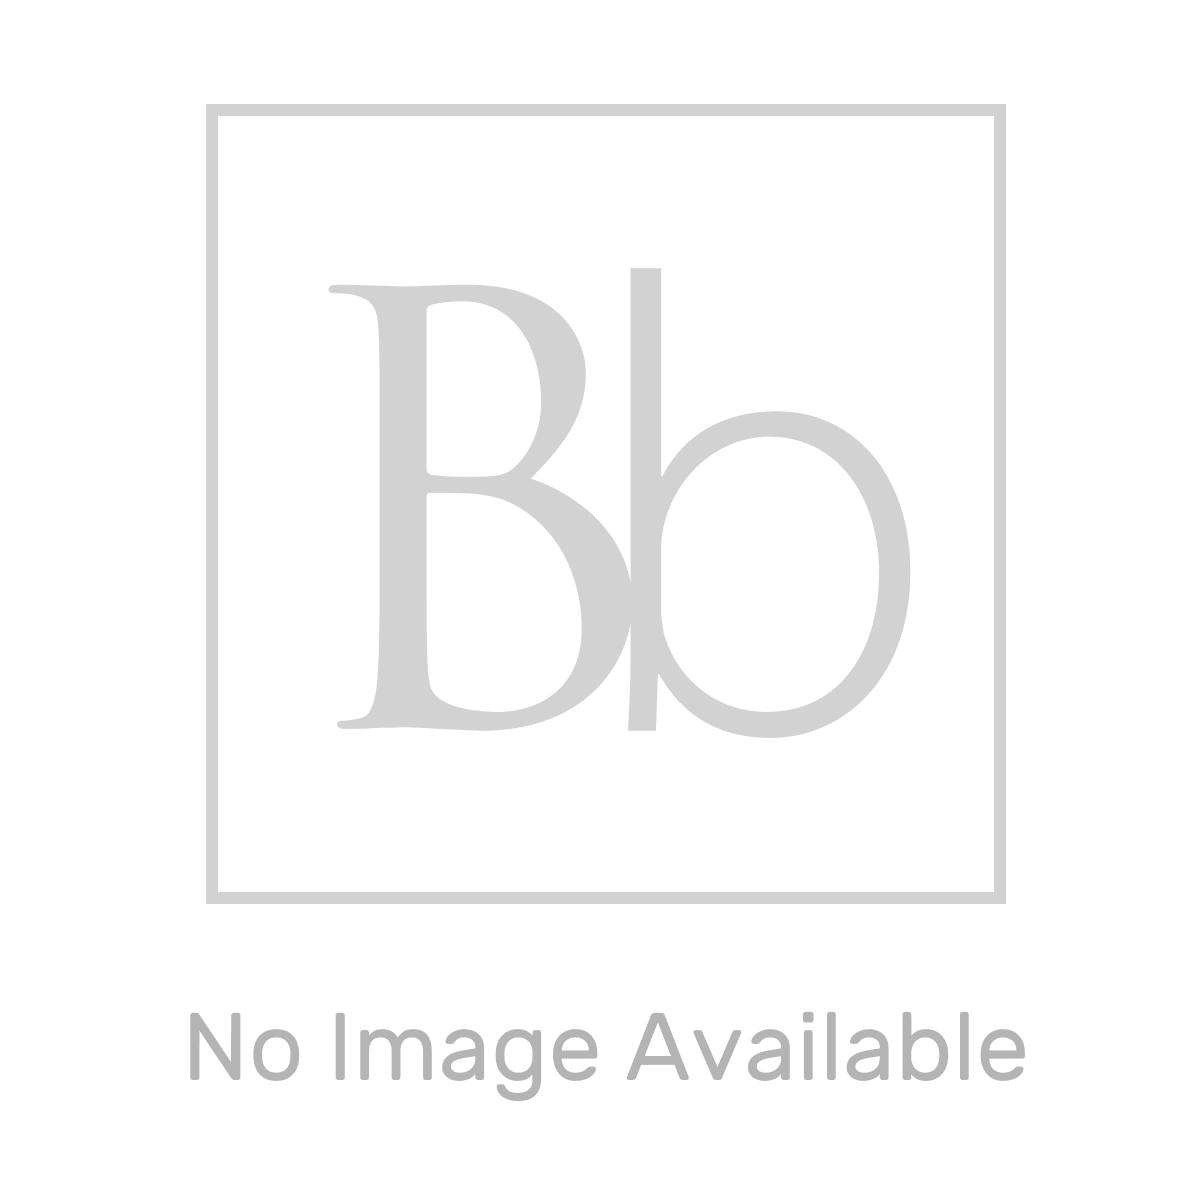 Homelux PVC Round Edge 9mm Black Tile Trim 2.44m